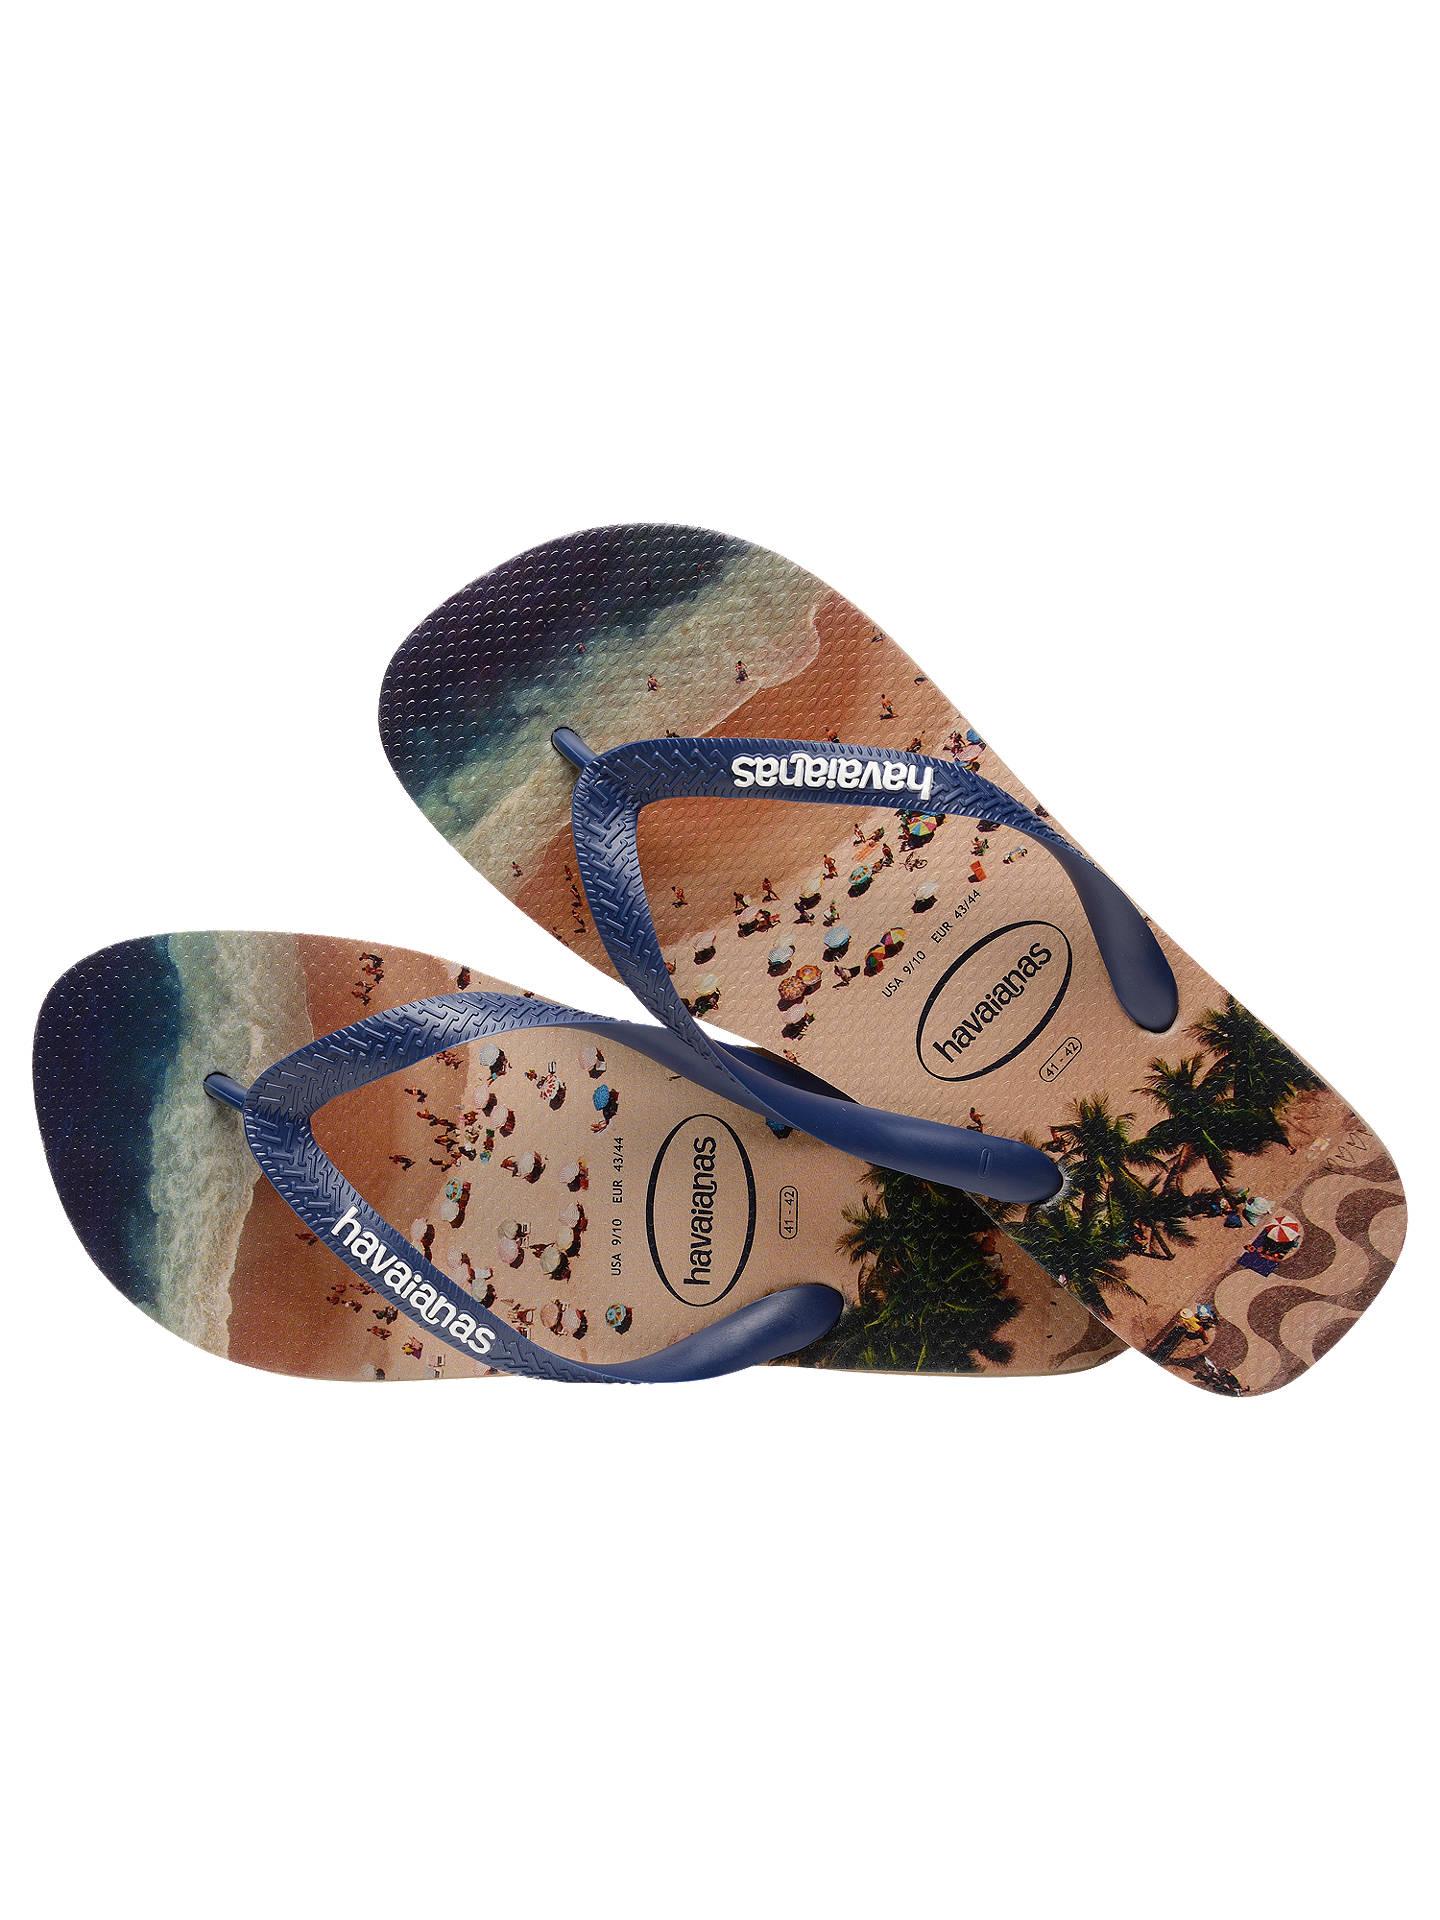 fad6d875a915 ... Buy Havaianas Beach Print Flip Flops